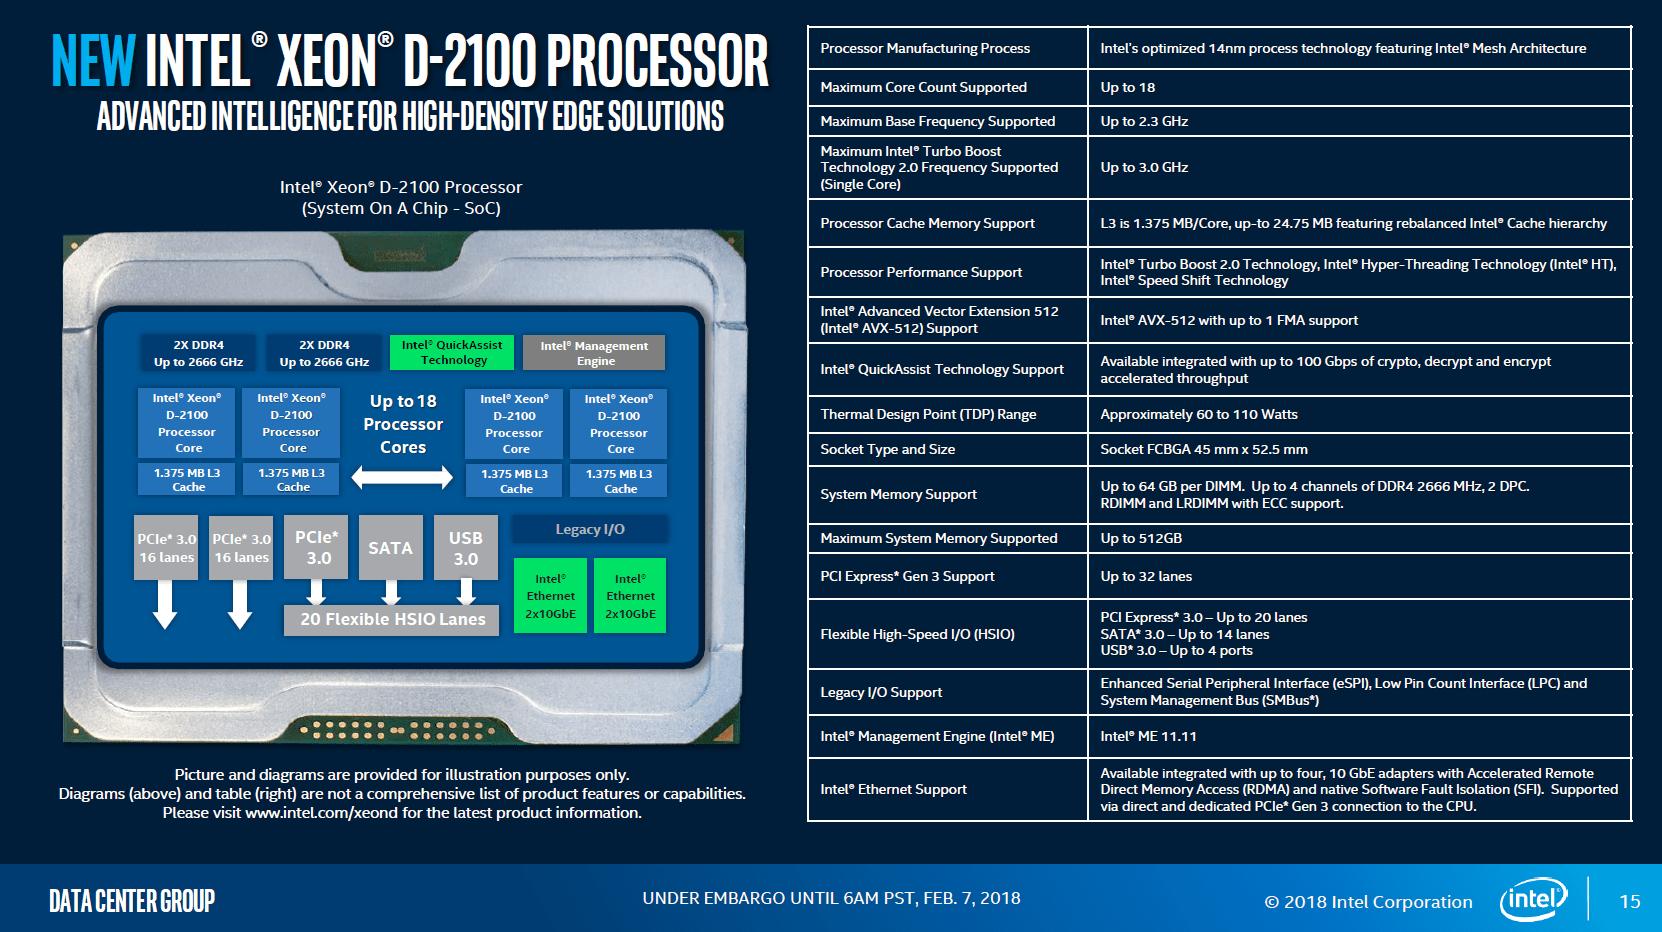 Intel Xeon D-2100 im Überblick